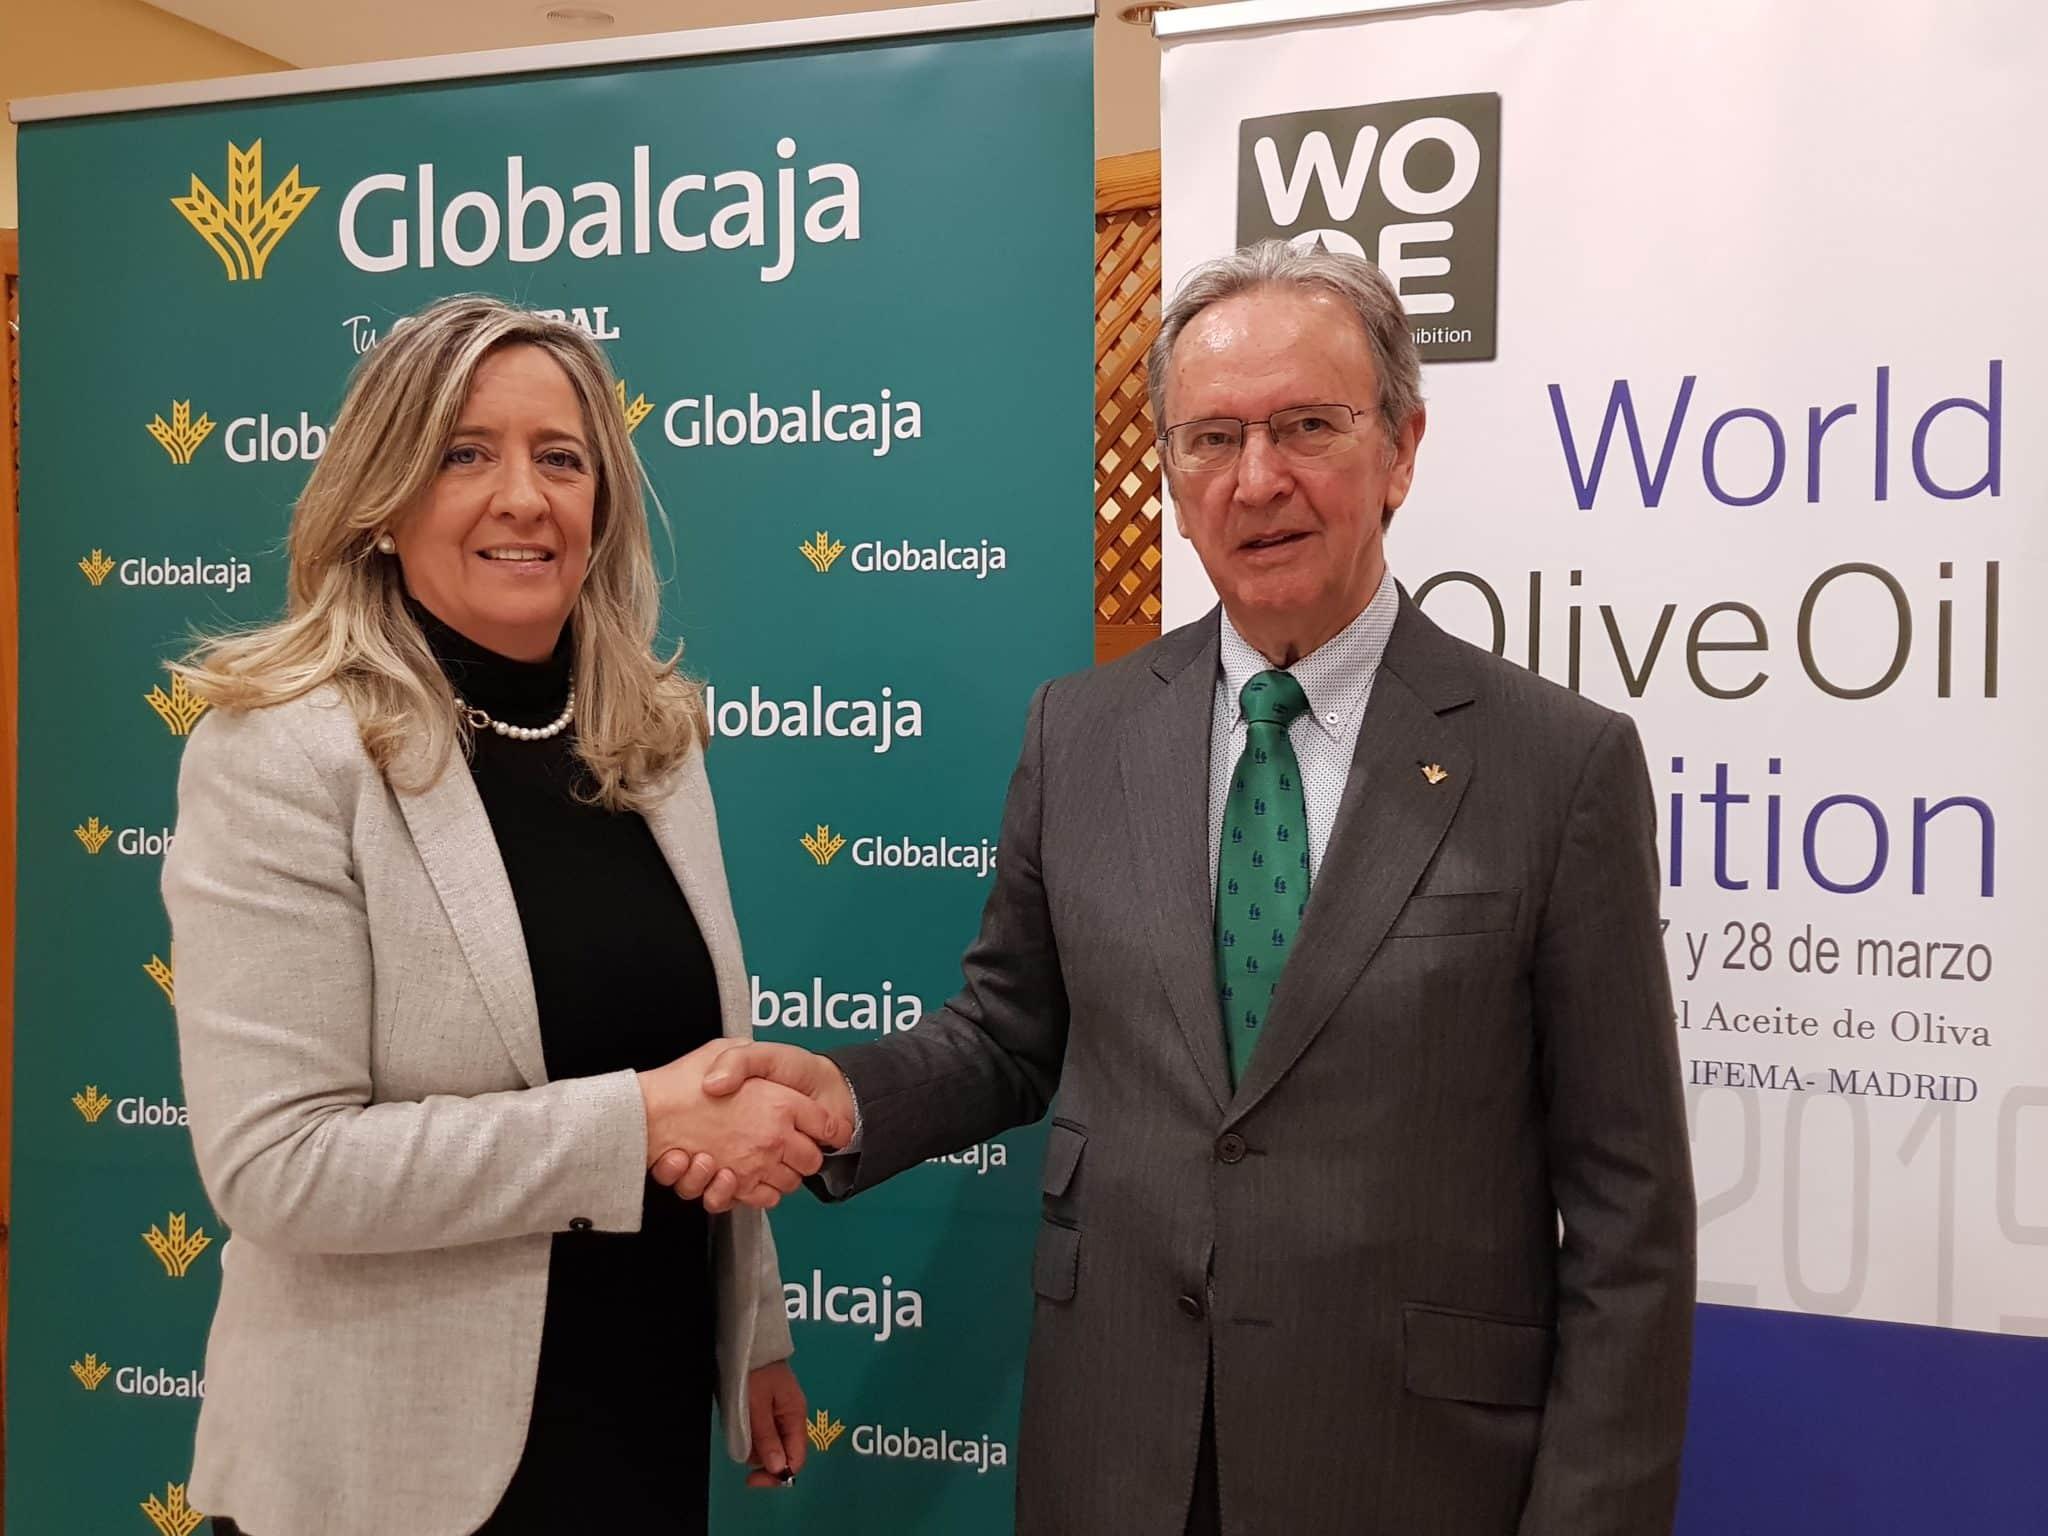 https://blog.globalcaja.es/wp-content/uploads/2019/03/Convenio-WOOE.jpeg